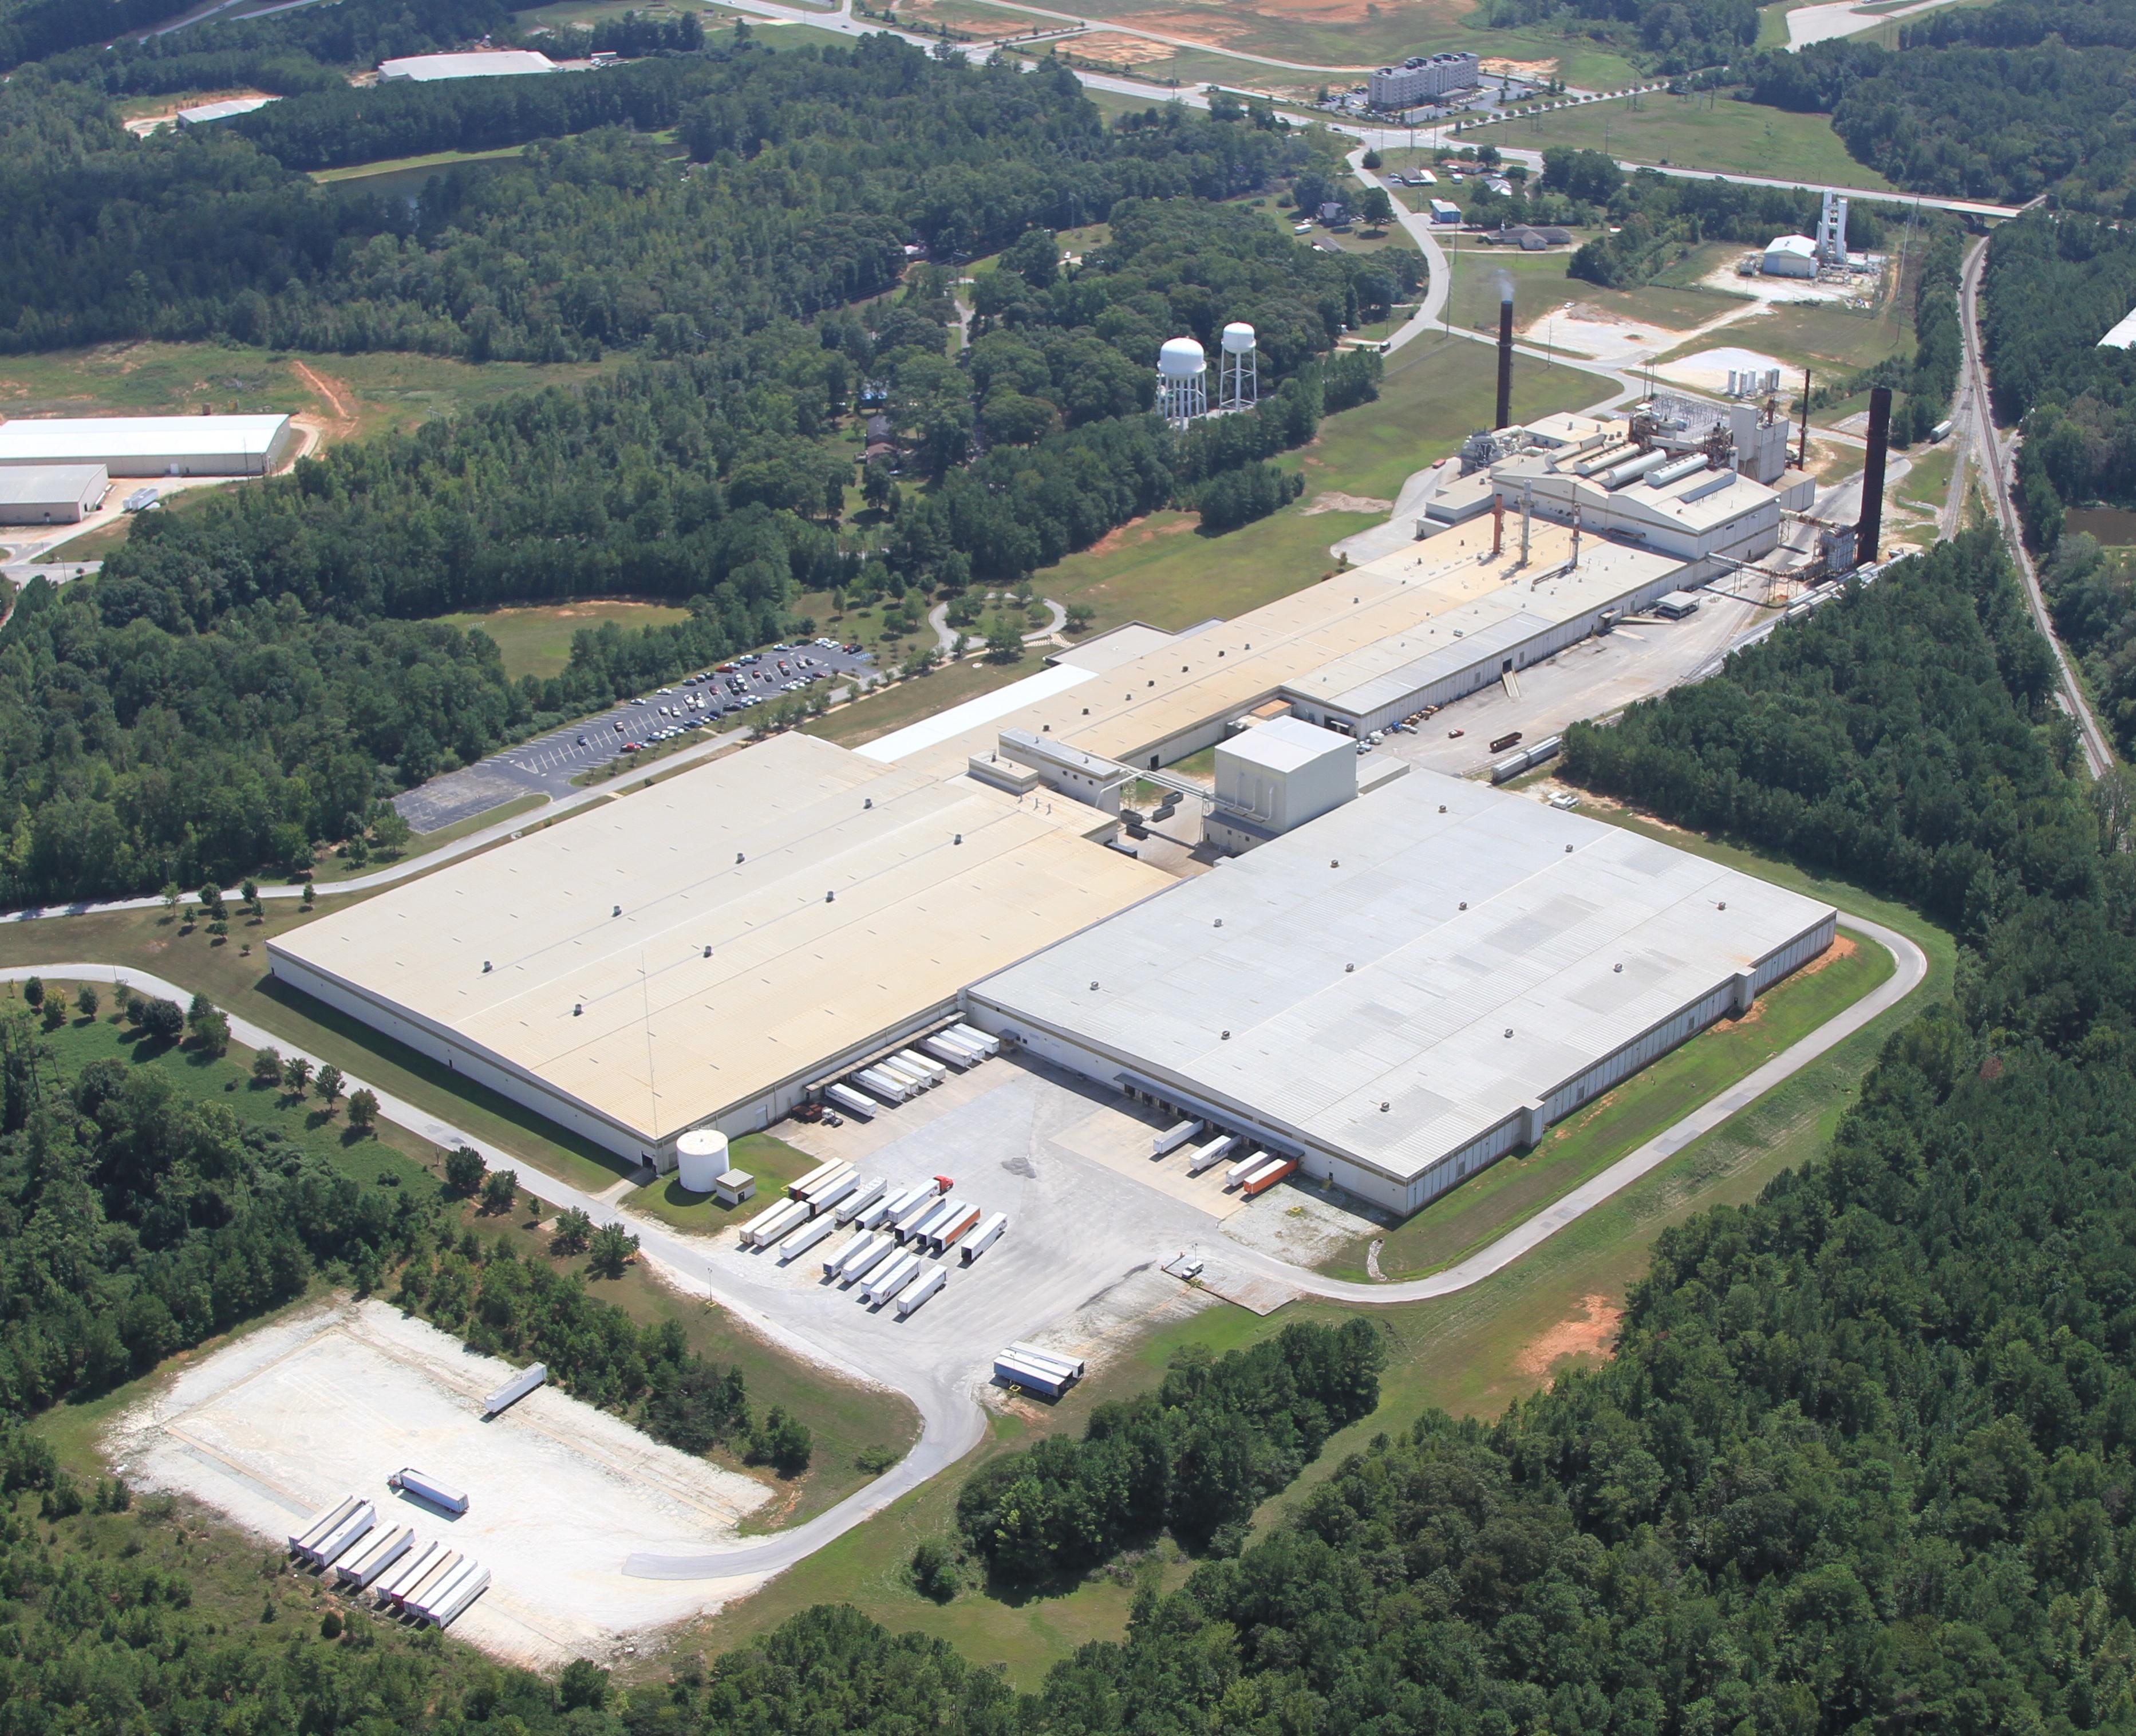 botole knauf : Knauf Insulation to expand Alabama plant, create 100 jobs